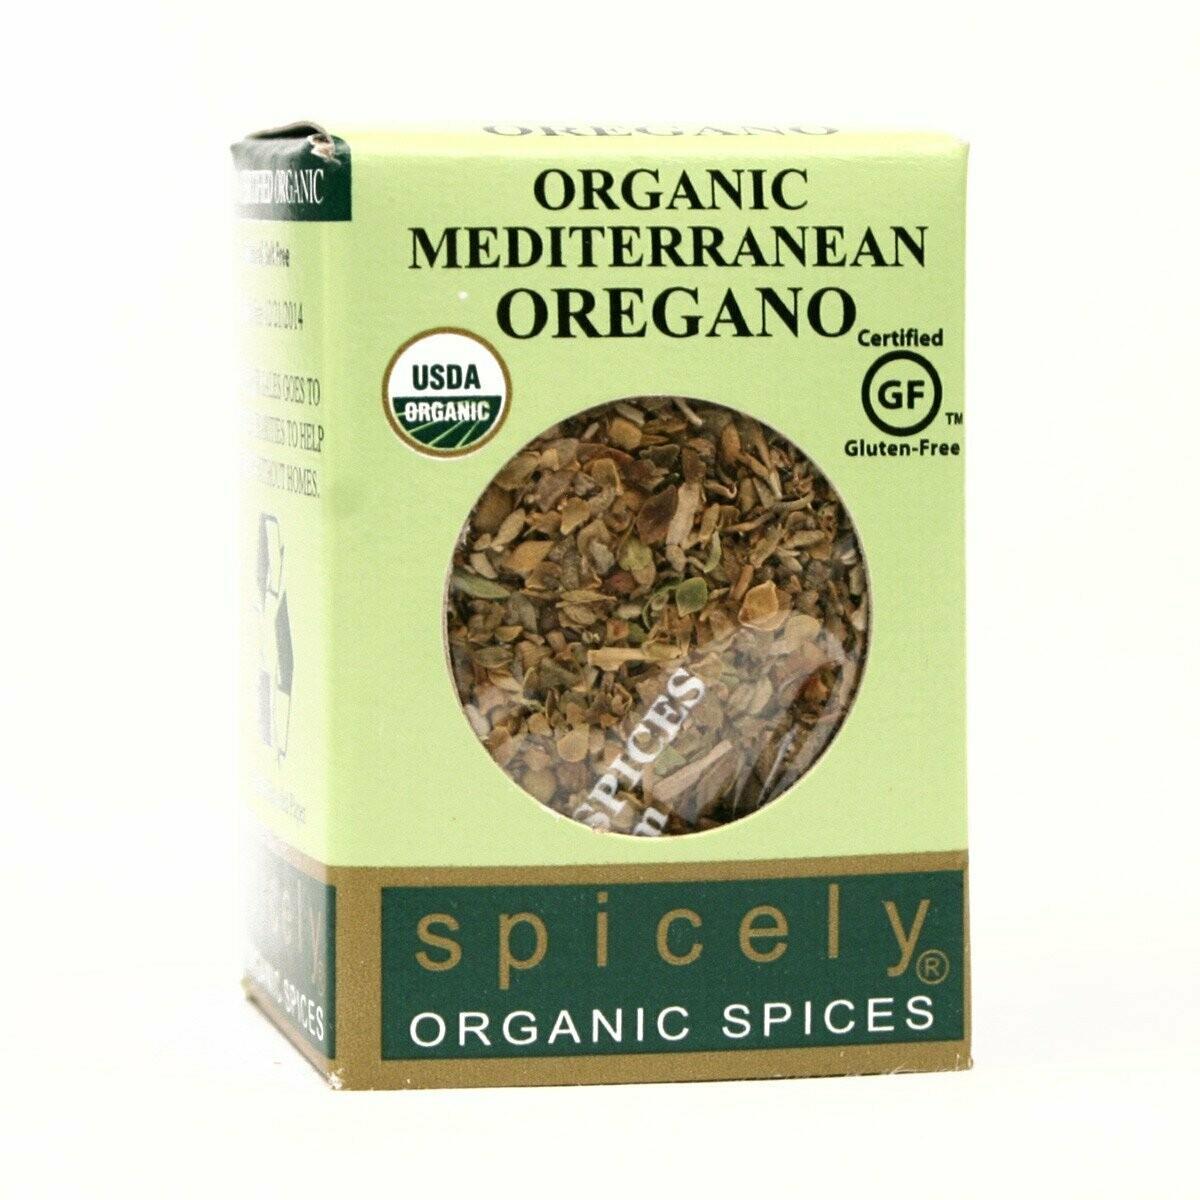 Organic Mediterranean Oregano